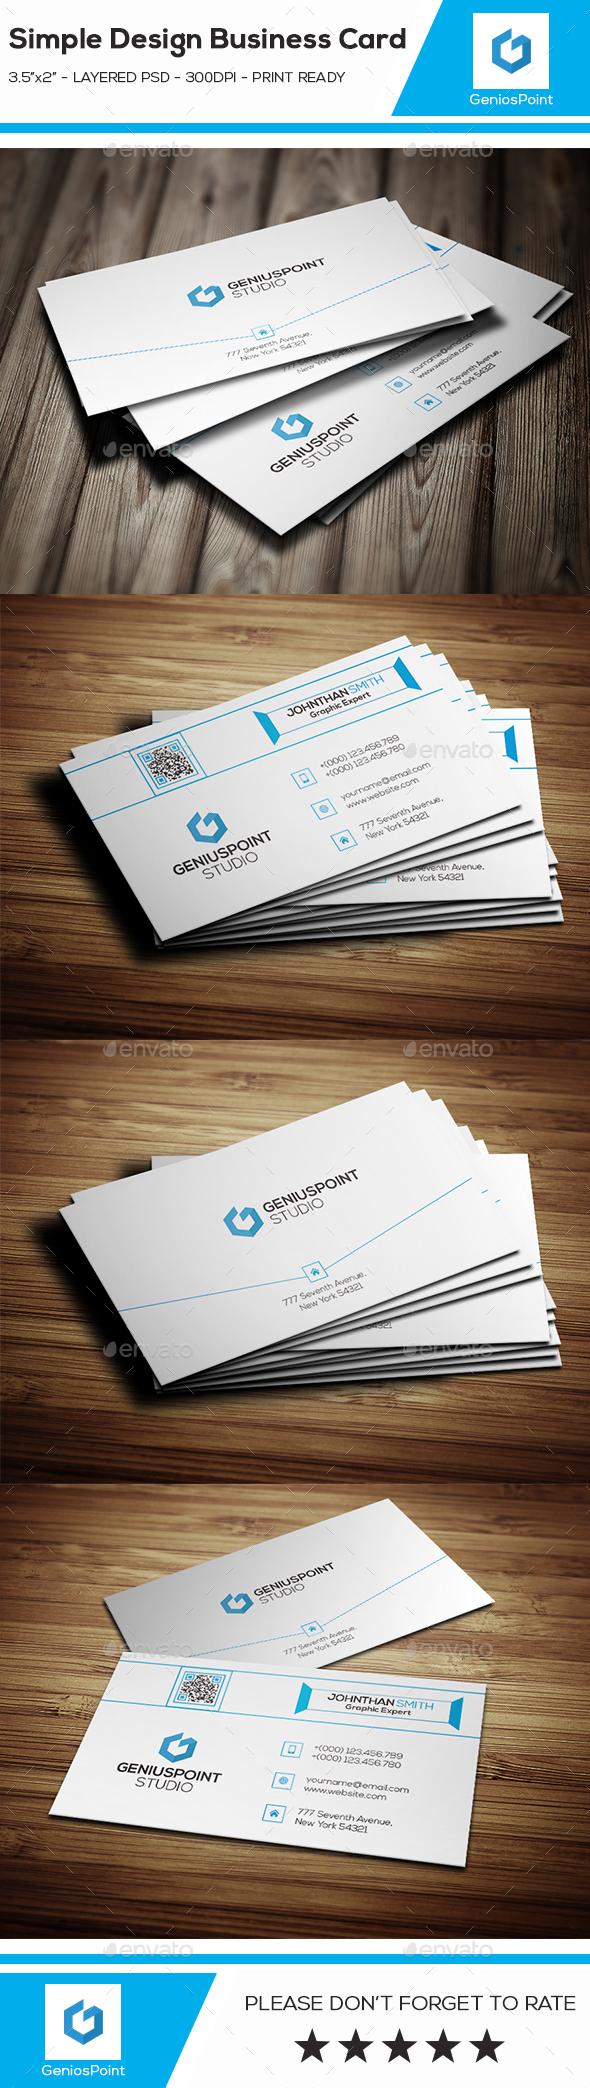 Simple Design Business Card. - Business Cards Print Templates